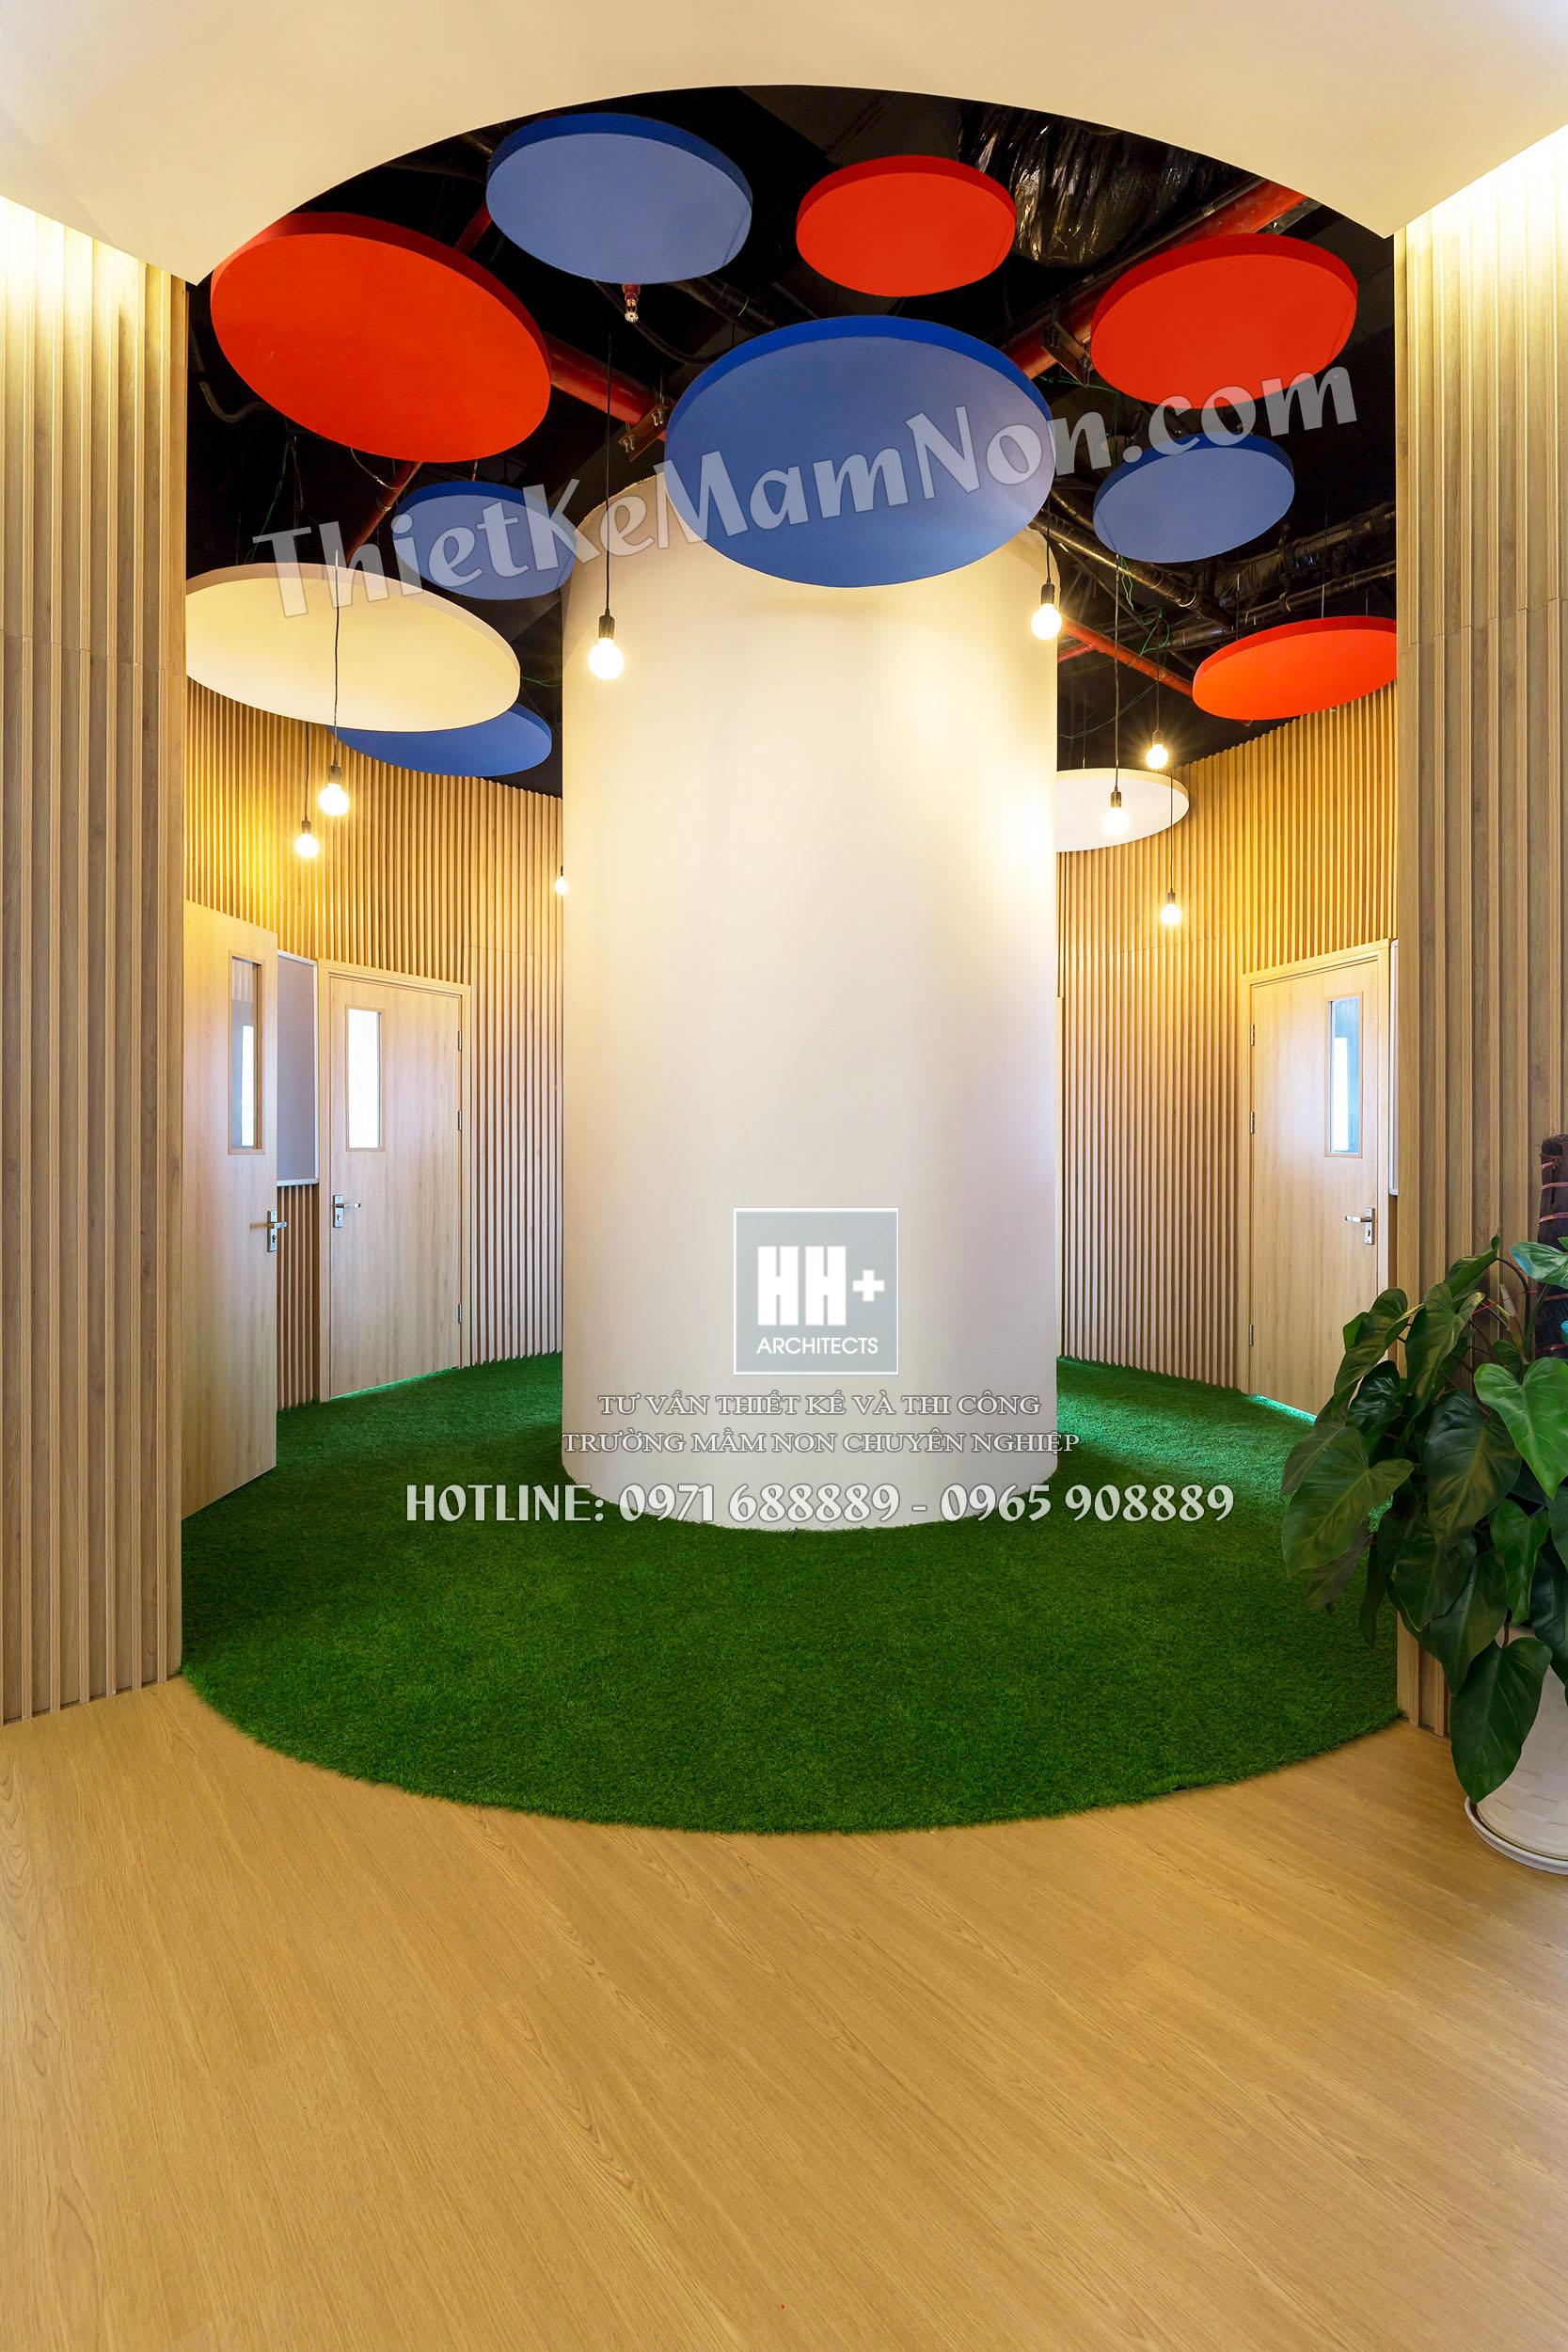 Rosemont_hanhlang_02 thiết kế trường mầm non Thiết kế trường mầm non Quốc Tế MỸ ROSEMONT Rosemont hanhlang 02